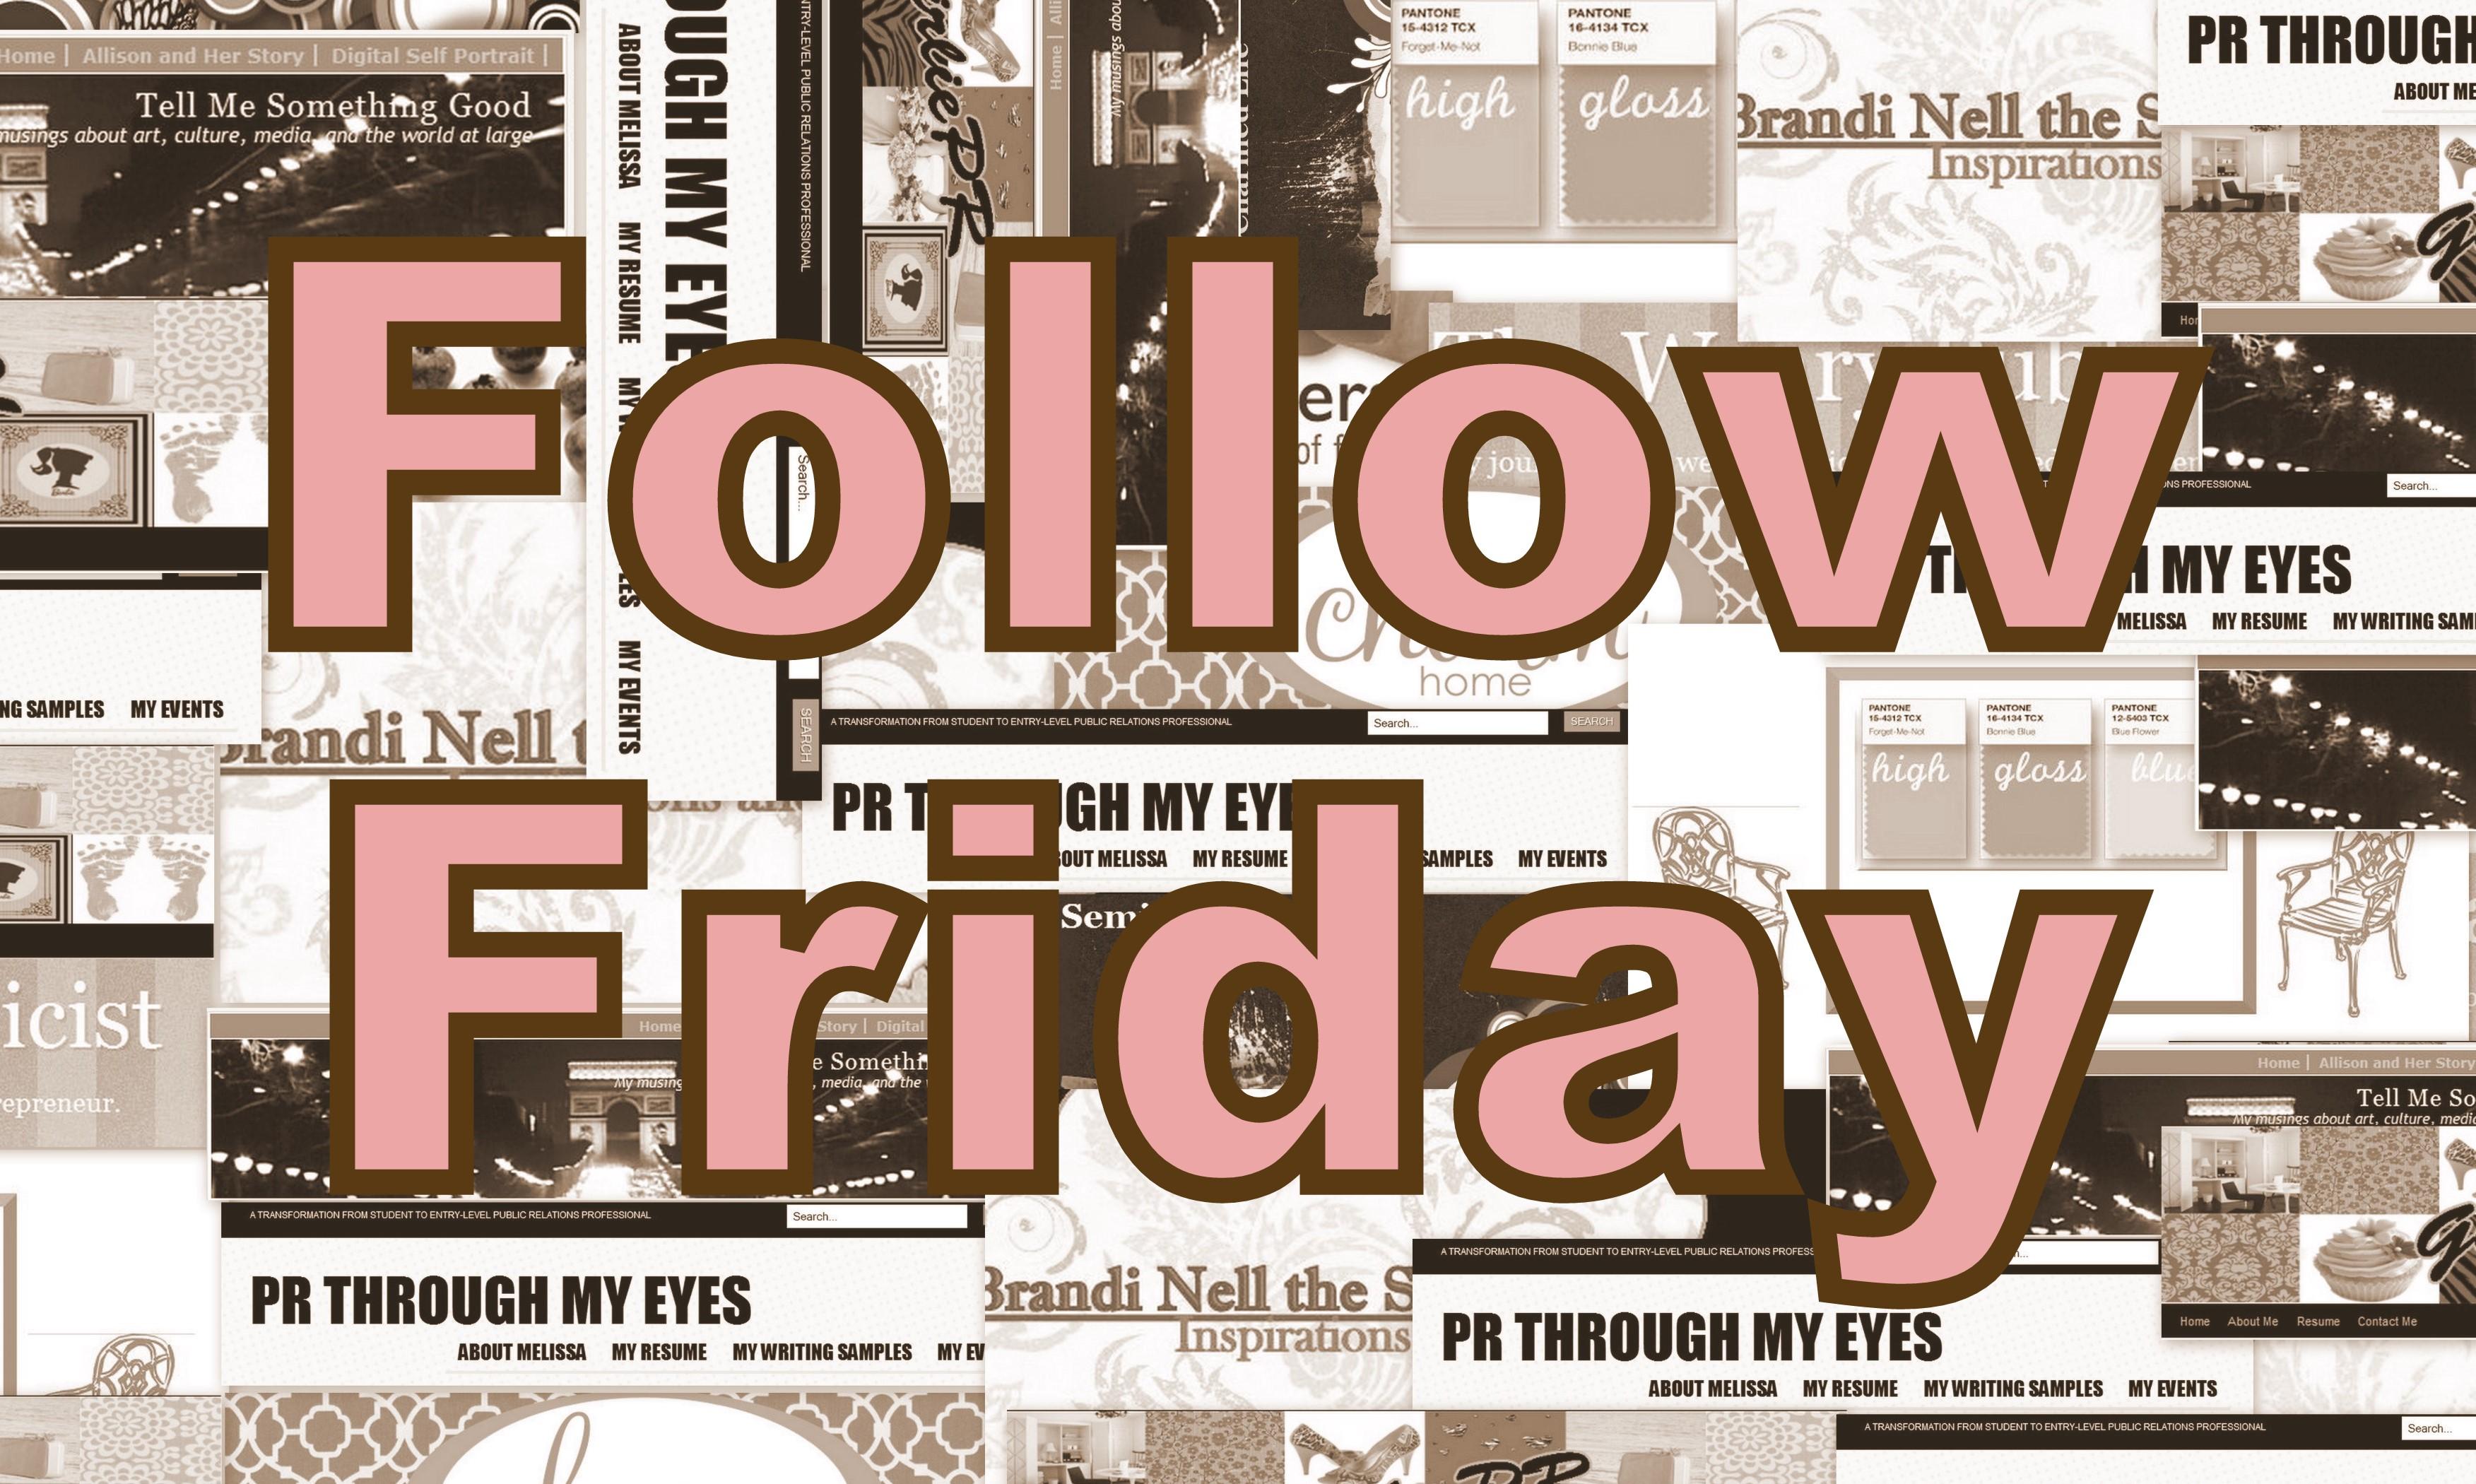 follow-fri-pic-good1